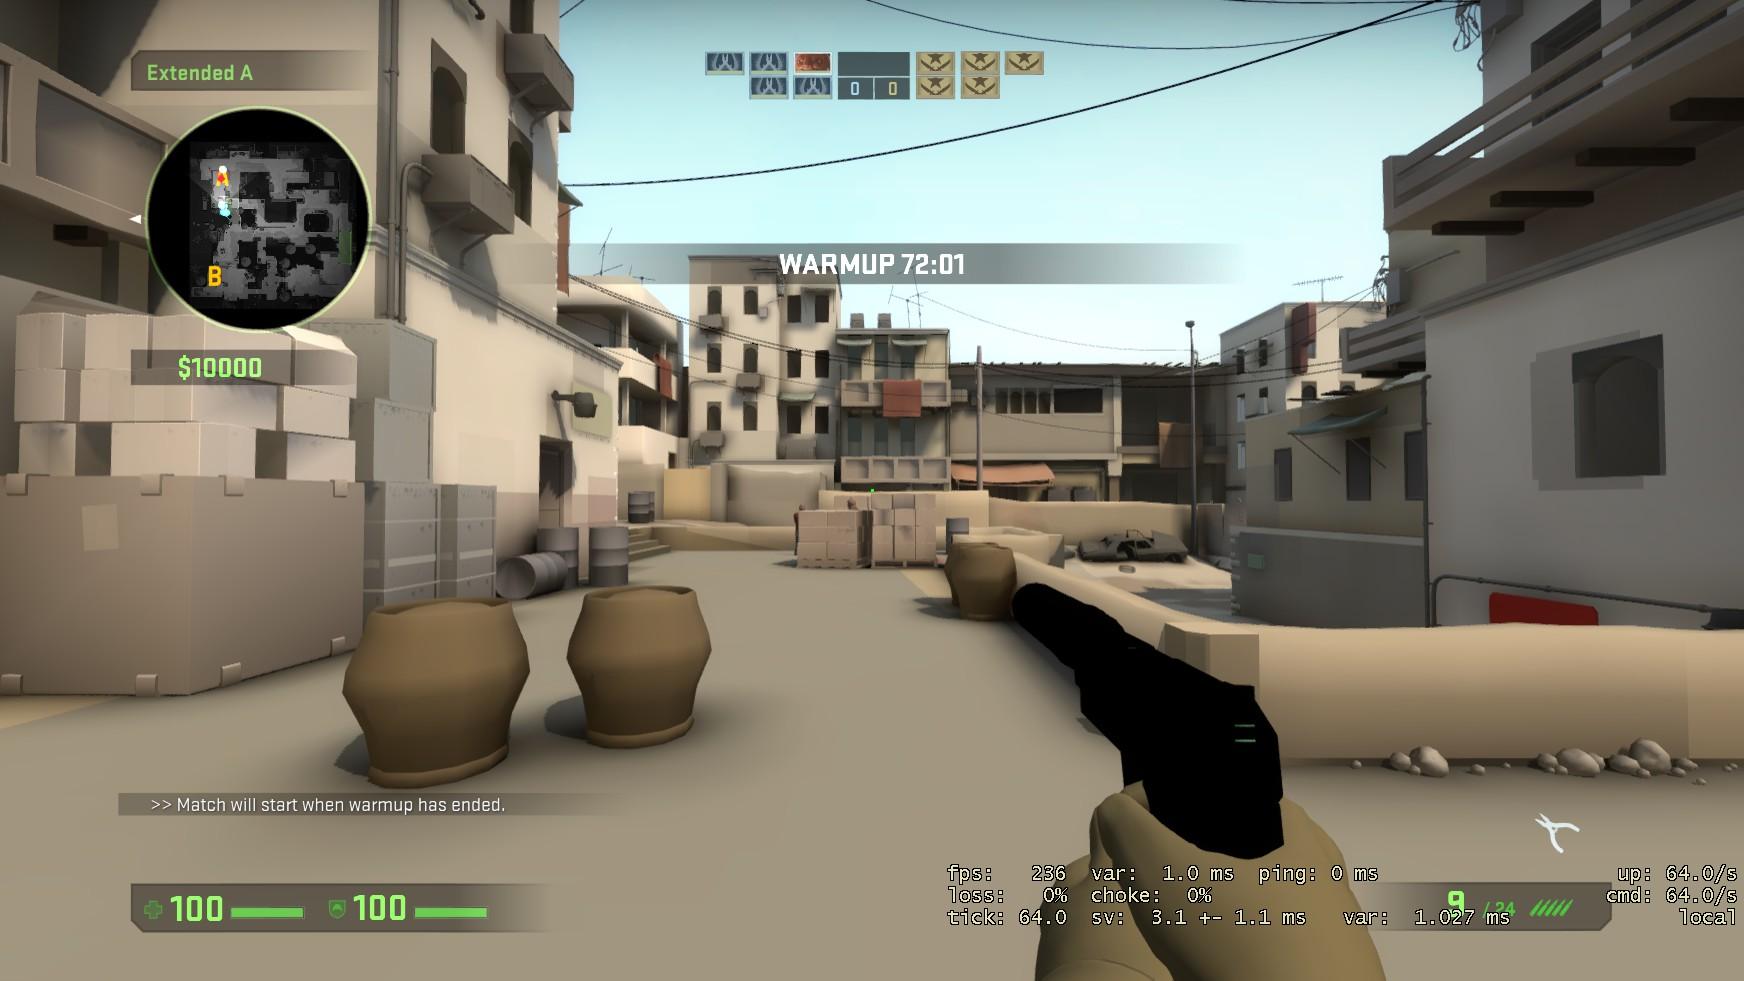 Steam Community :: Guide :: Как поднять FPS в CS:GO? [RUS]